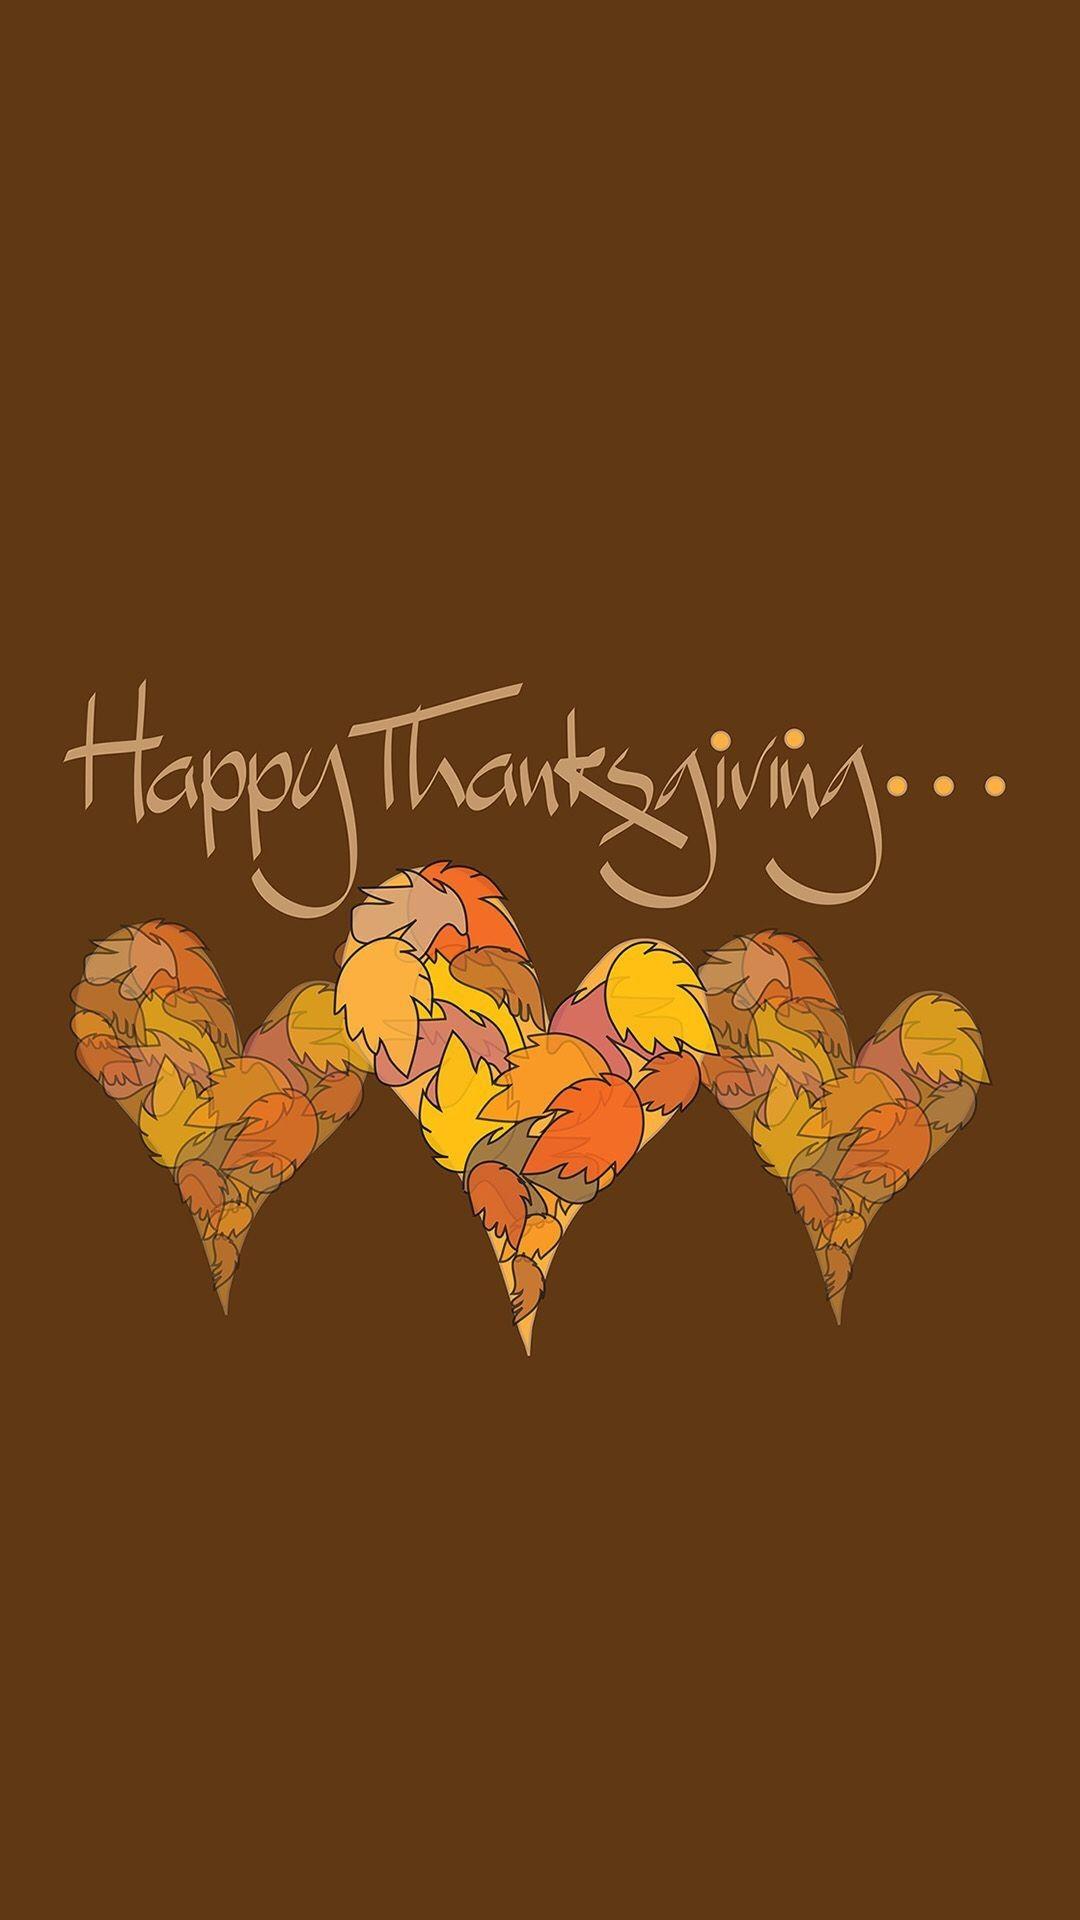 Minimalist Thanksgiving Wallpapers - Wallpaper Cave